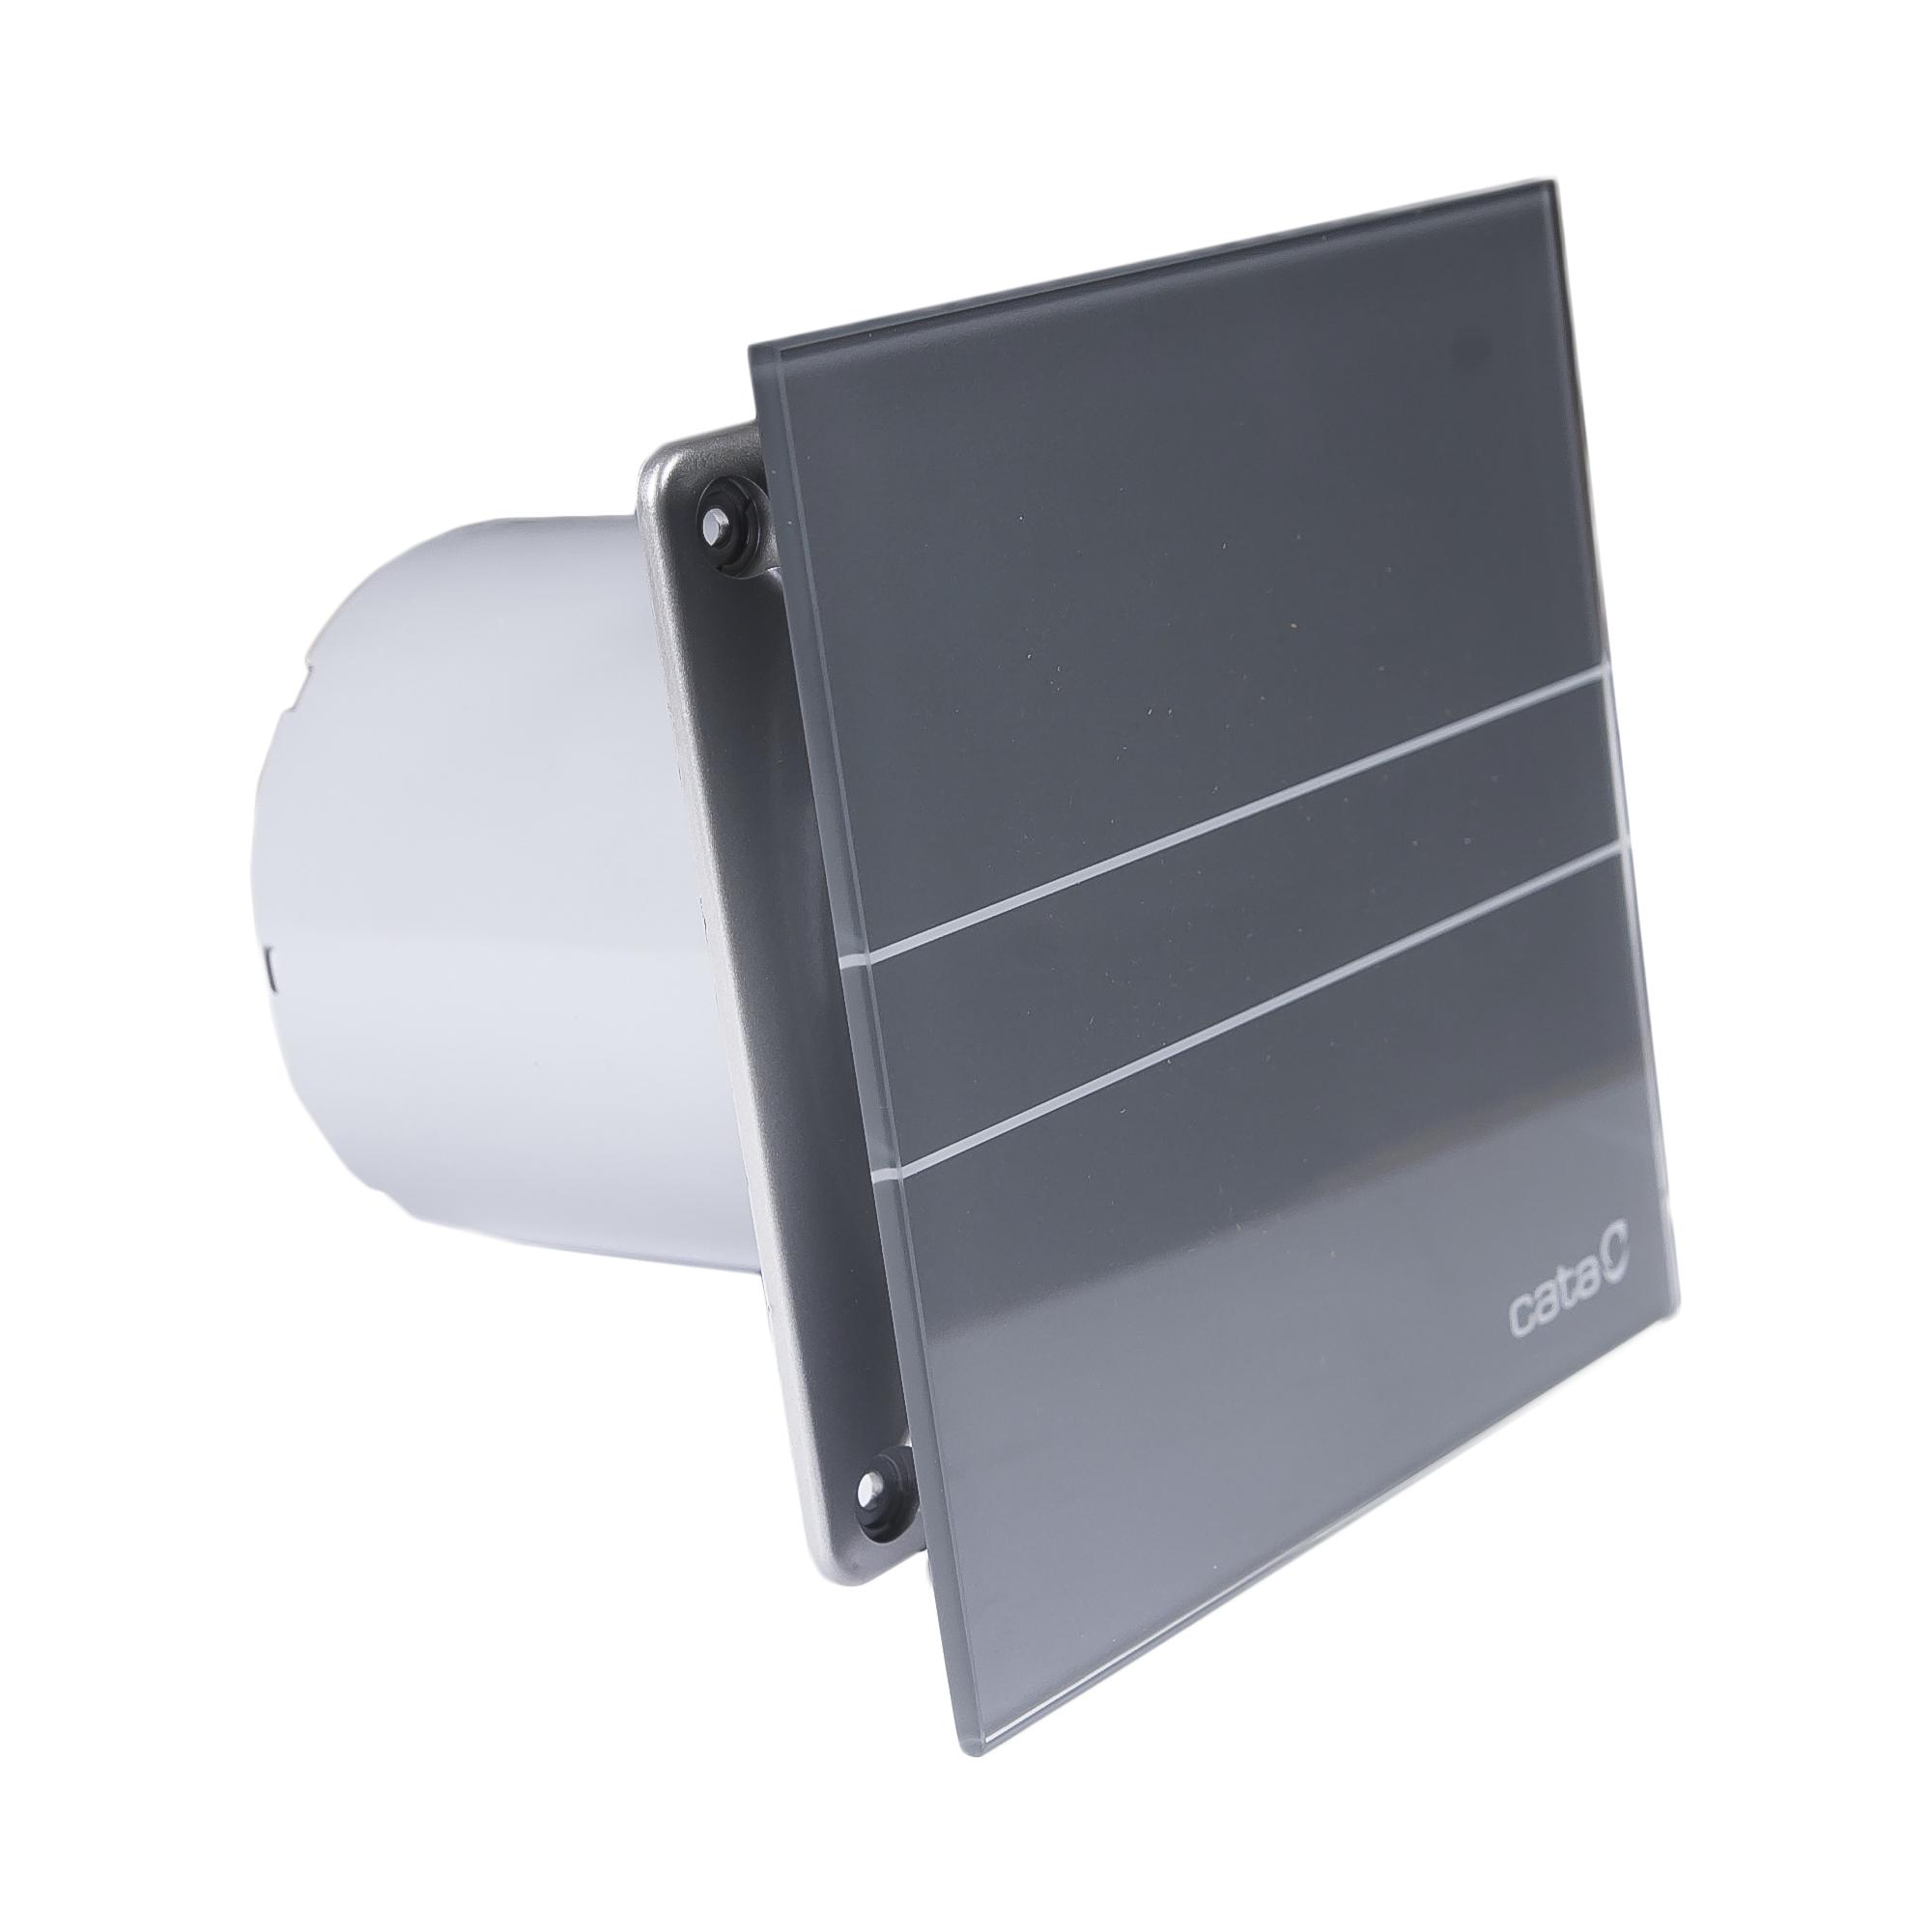 Вентилятор e-100 gs. Стекло. Серый CATA вентилятор e 100 gbk стекло черный cata